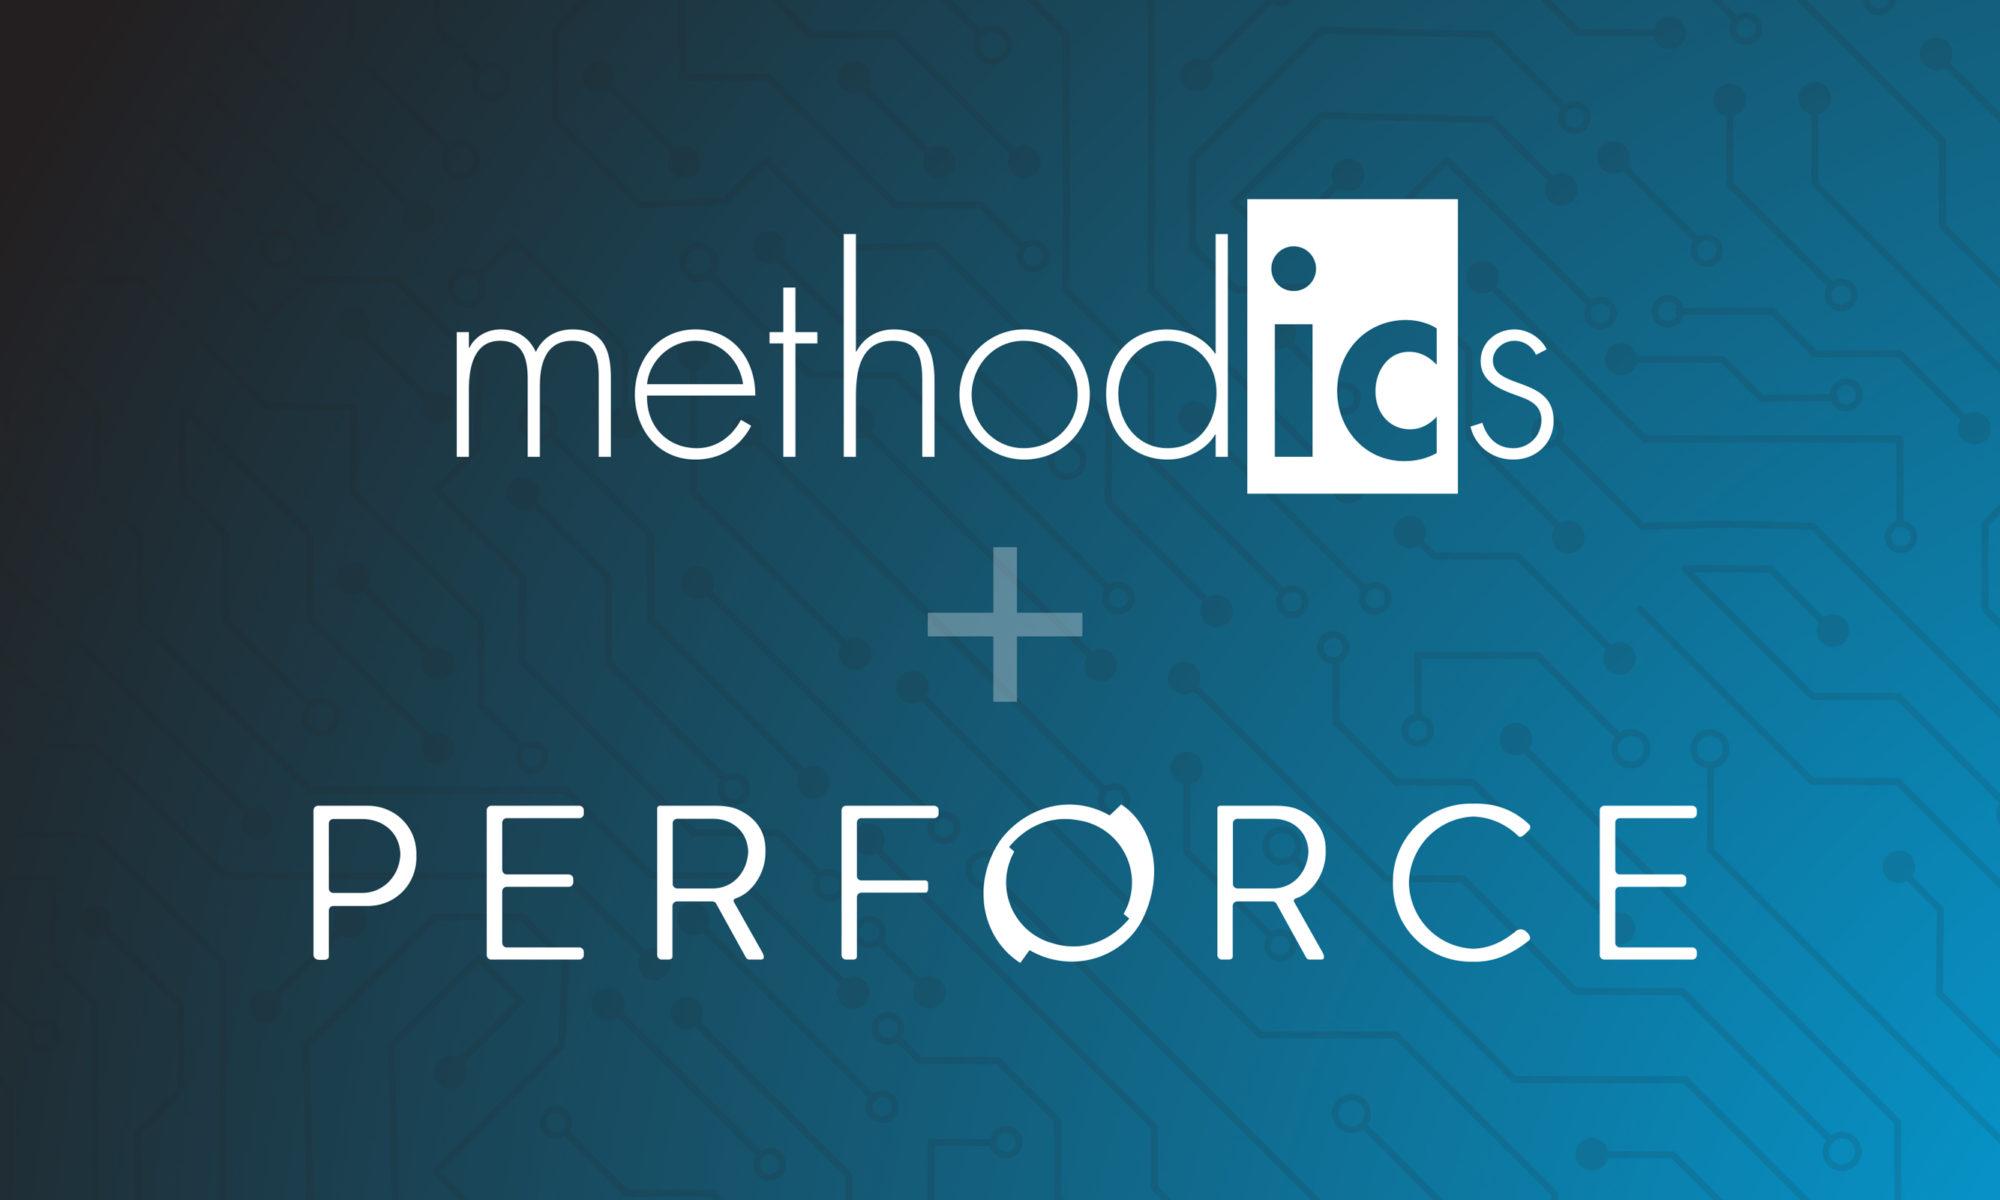 image press release perforce methodics